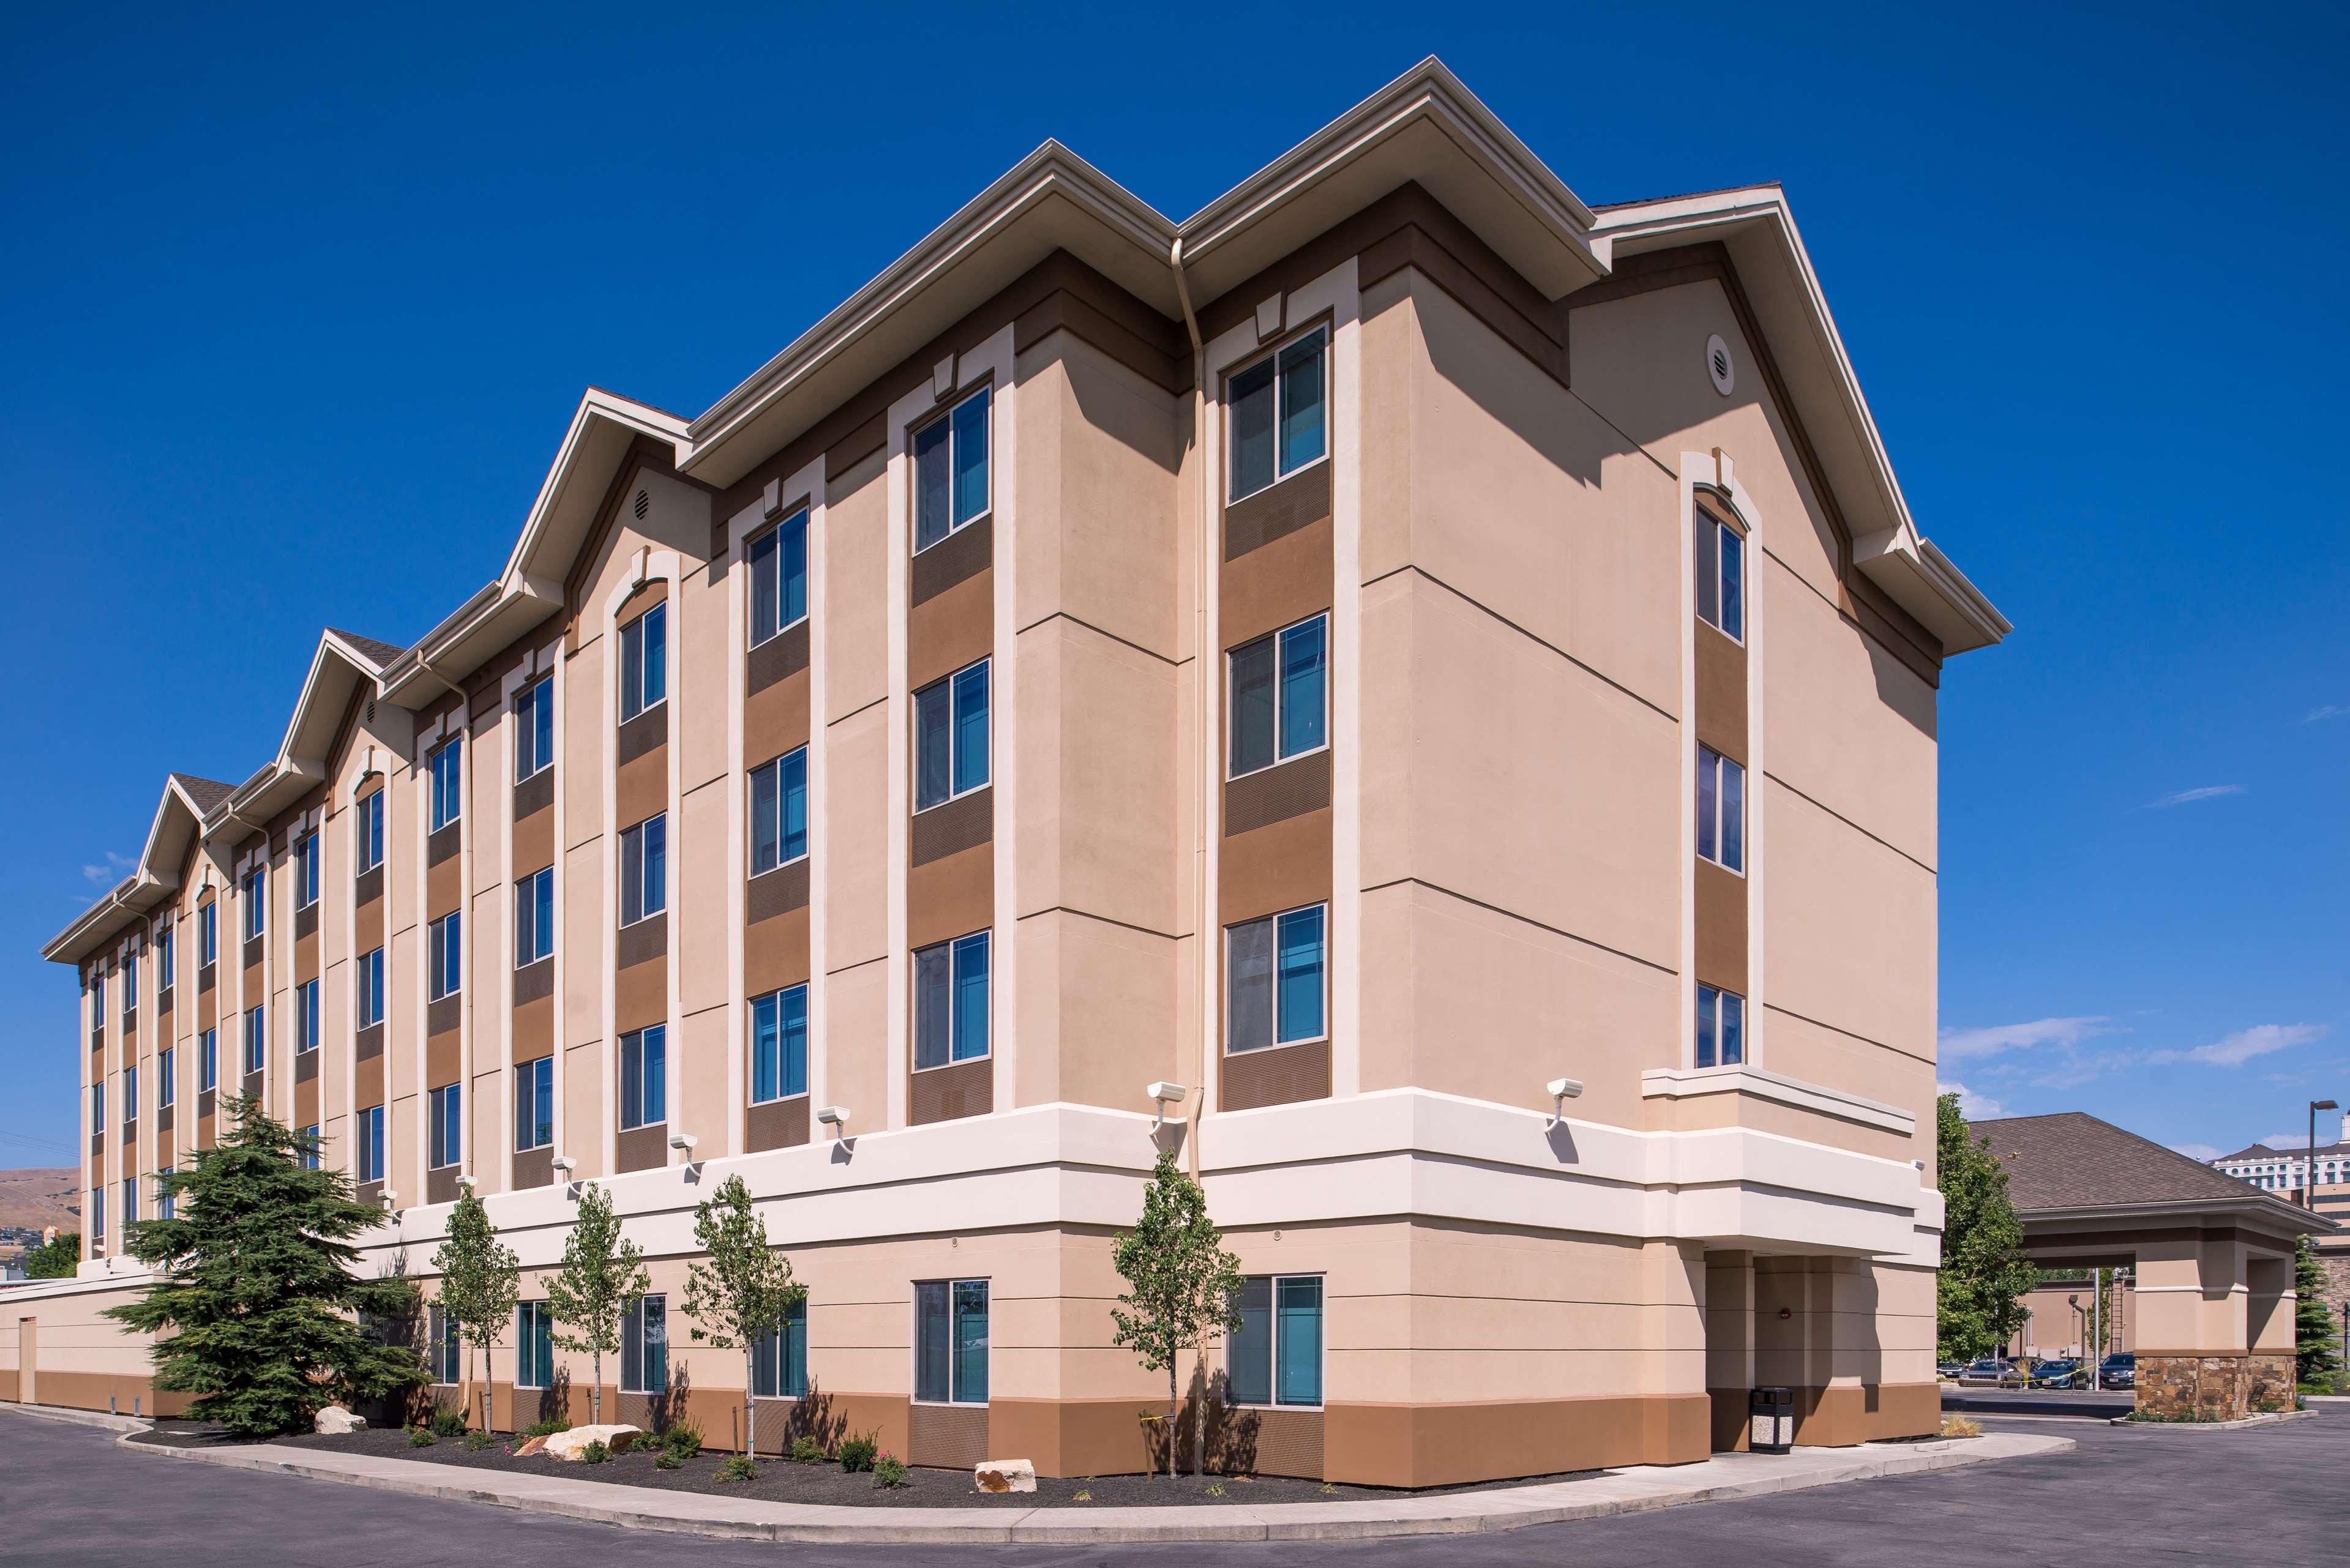 Hilton Garden Inn Salt Lake City Downtown image 0